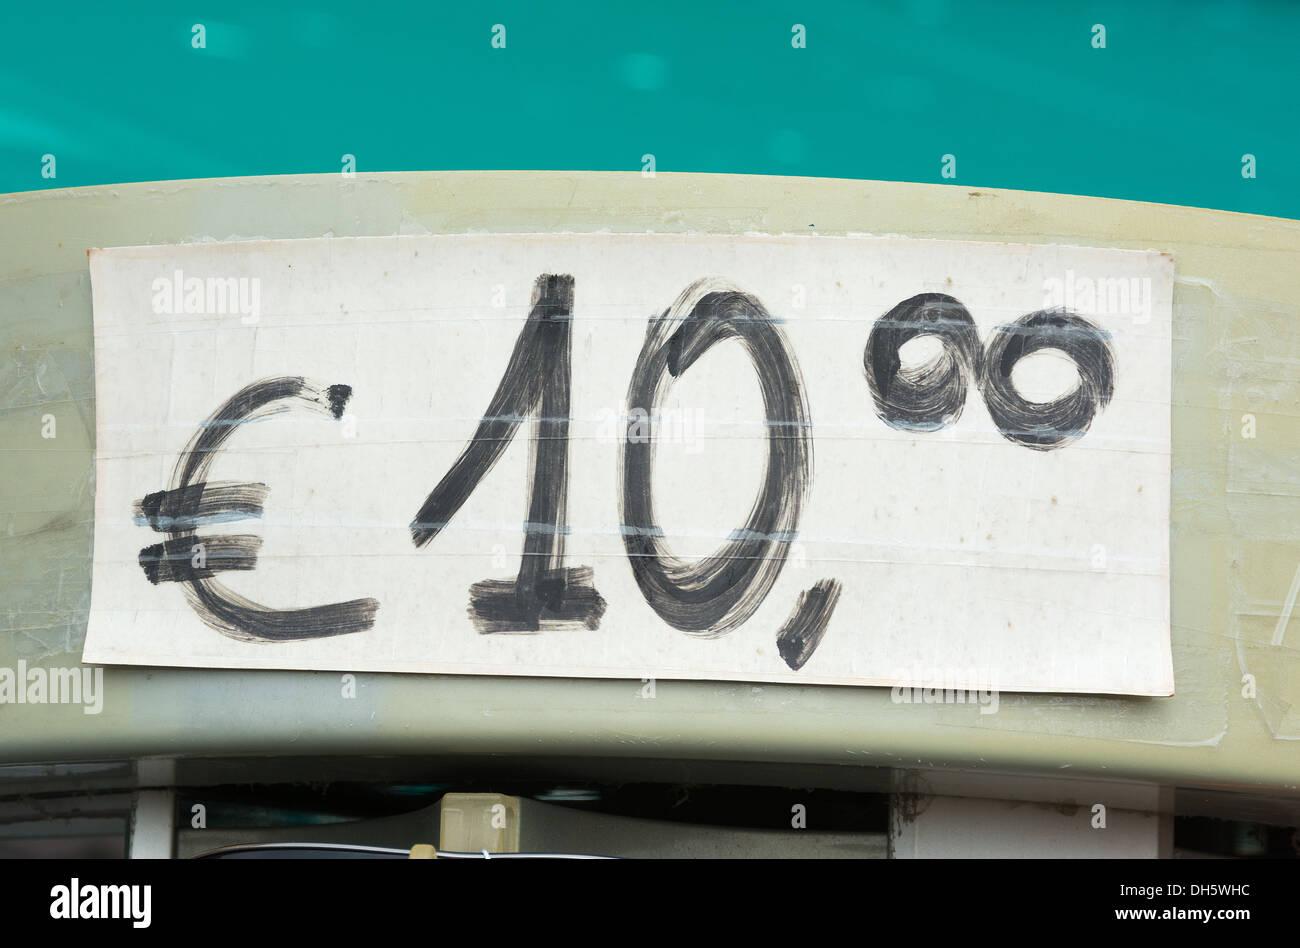 Hand written price tag for ten euros - Stock Image